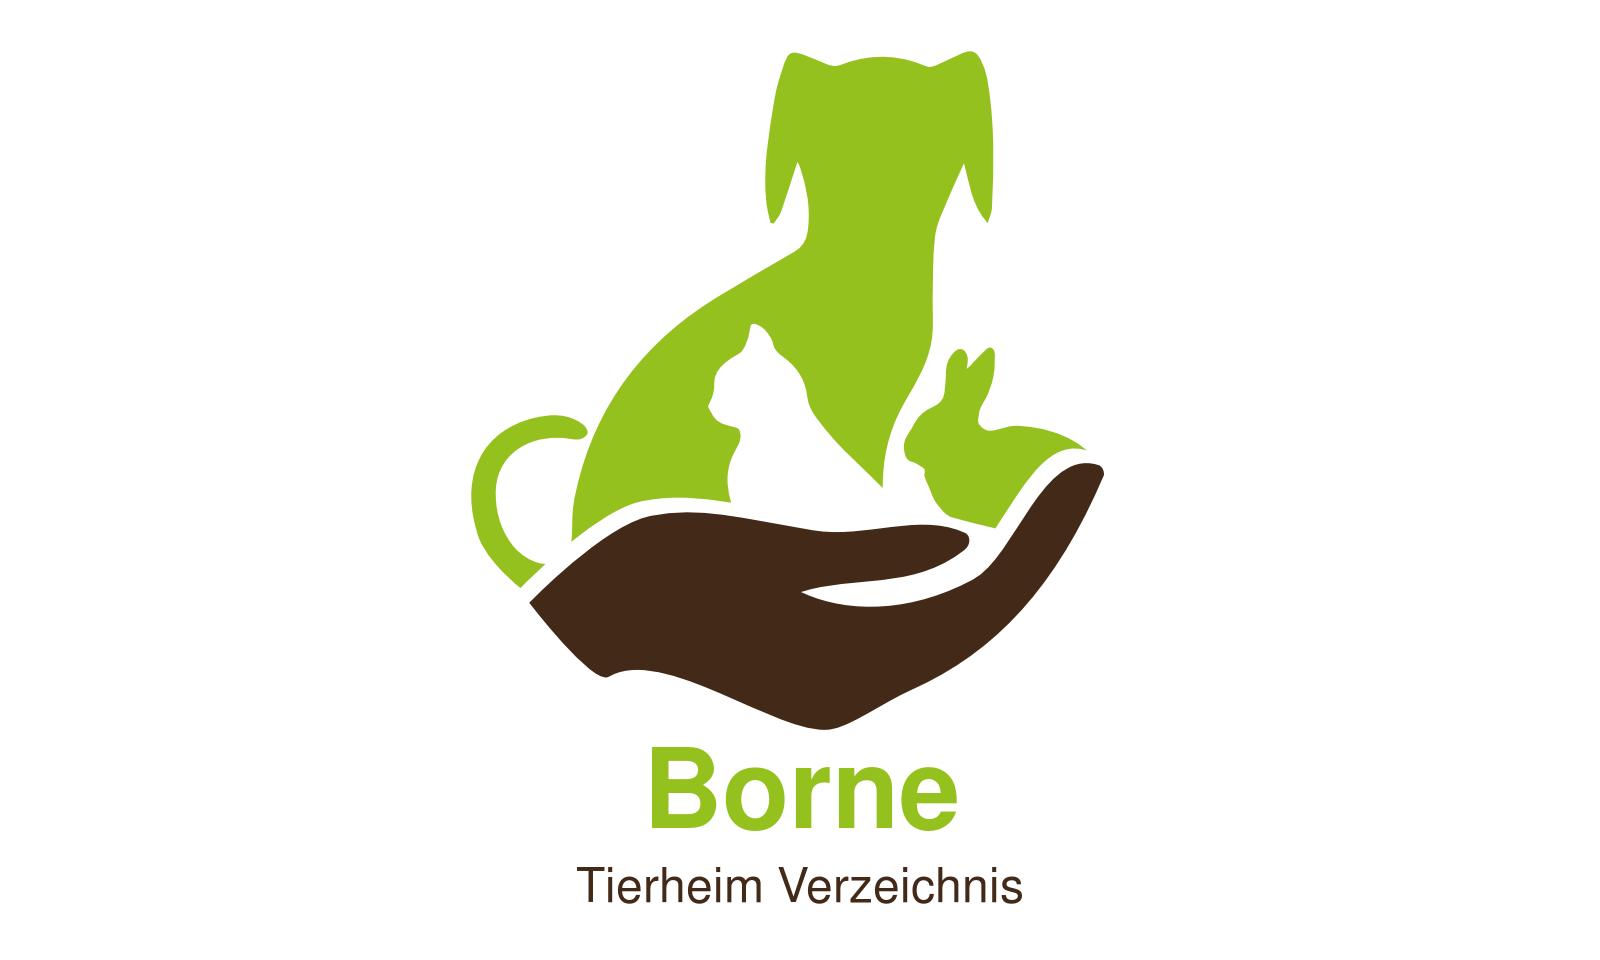 Tierheim Borne